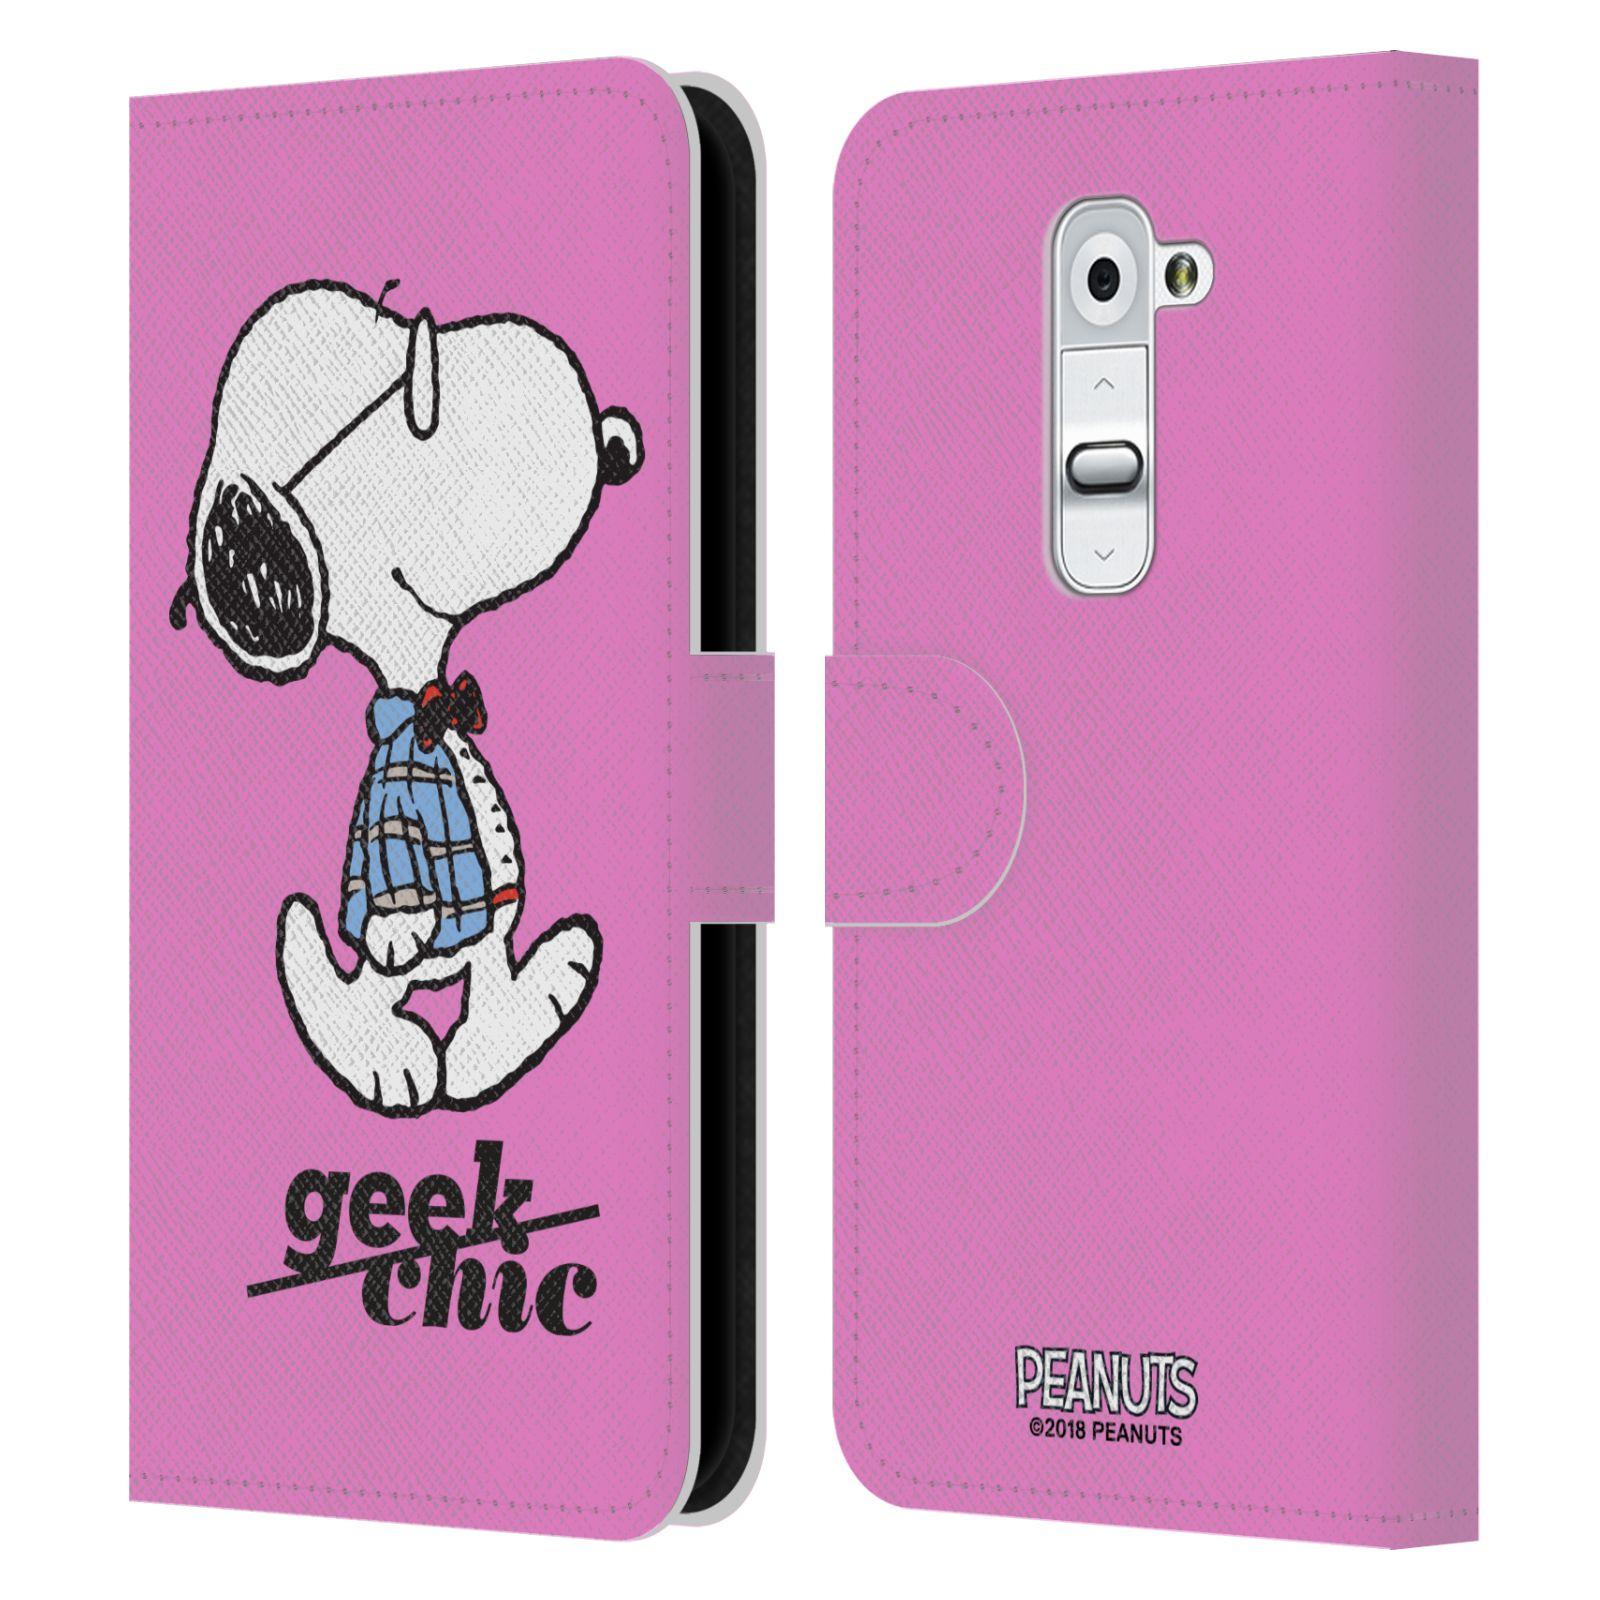 Pouzdro na mobil LG G2 - Head Case - Peanuts - růžový pejsek snoopy nerd